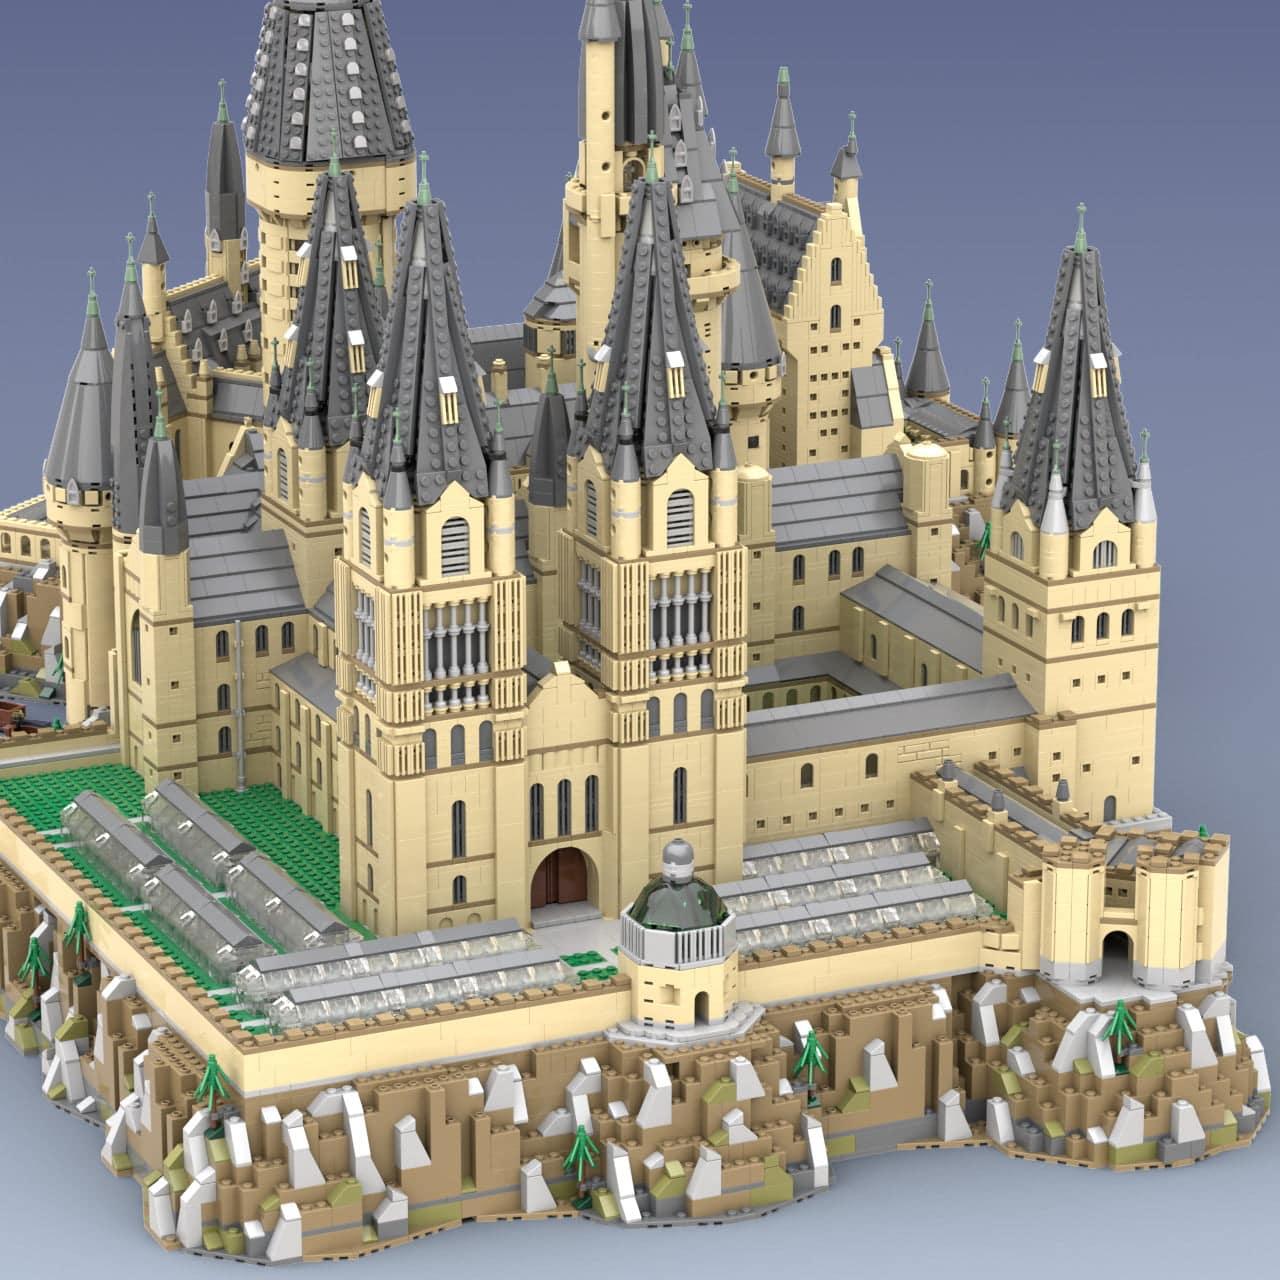 Hogwart's Castle (71043) Extension